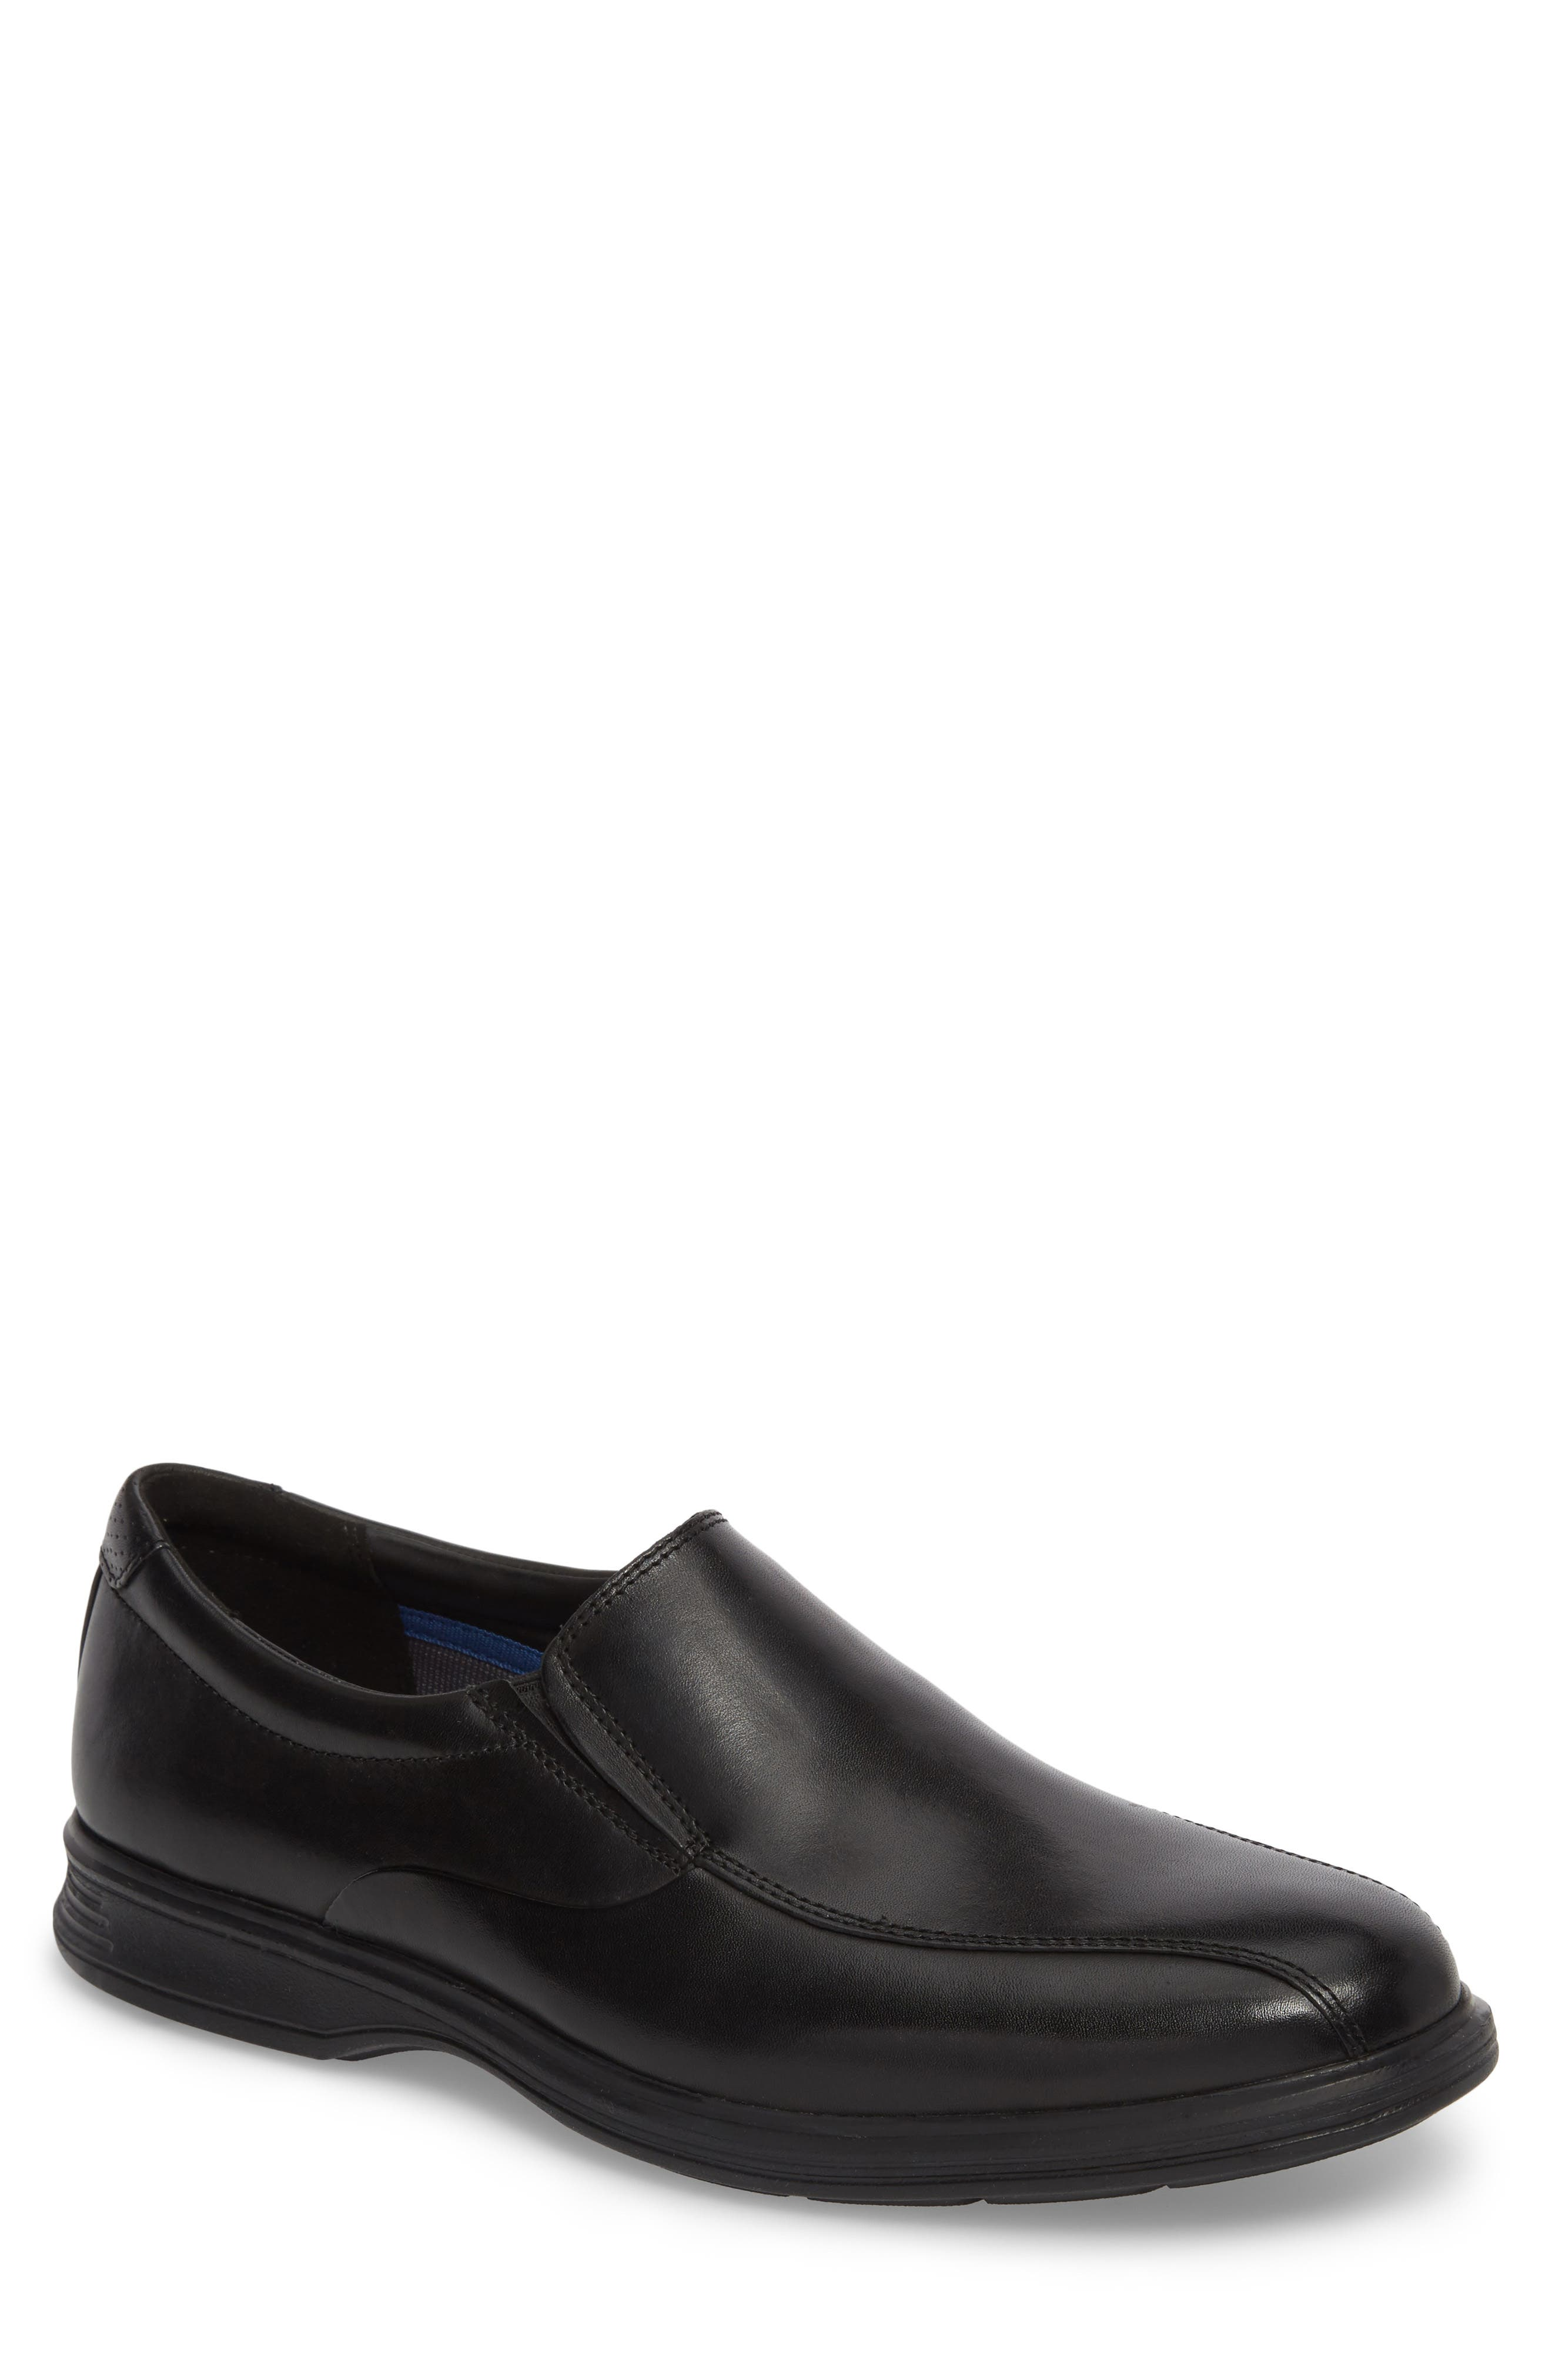 Dressports 2 Lite Venetian Loafer,                             Main thumbnail 1, color,                             BLACK LEATHER